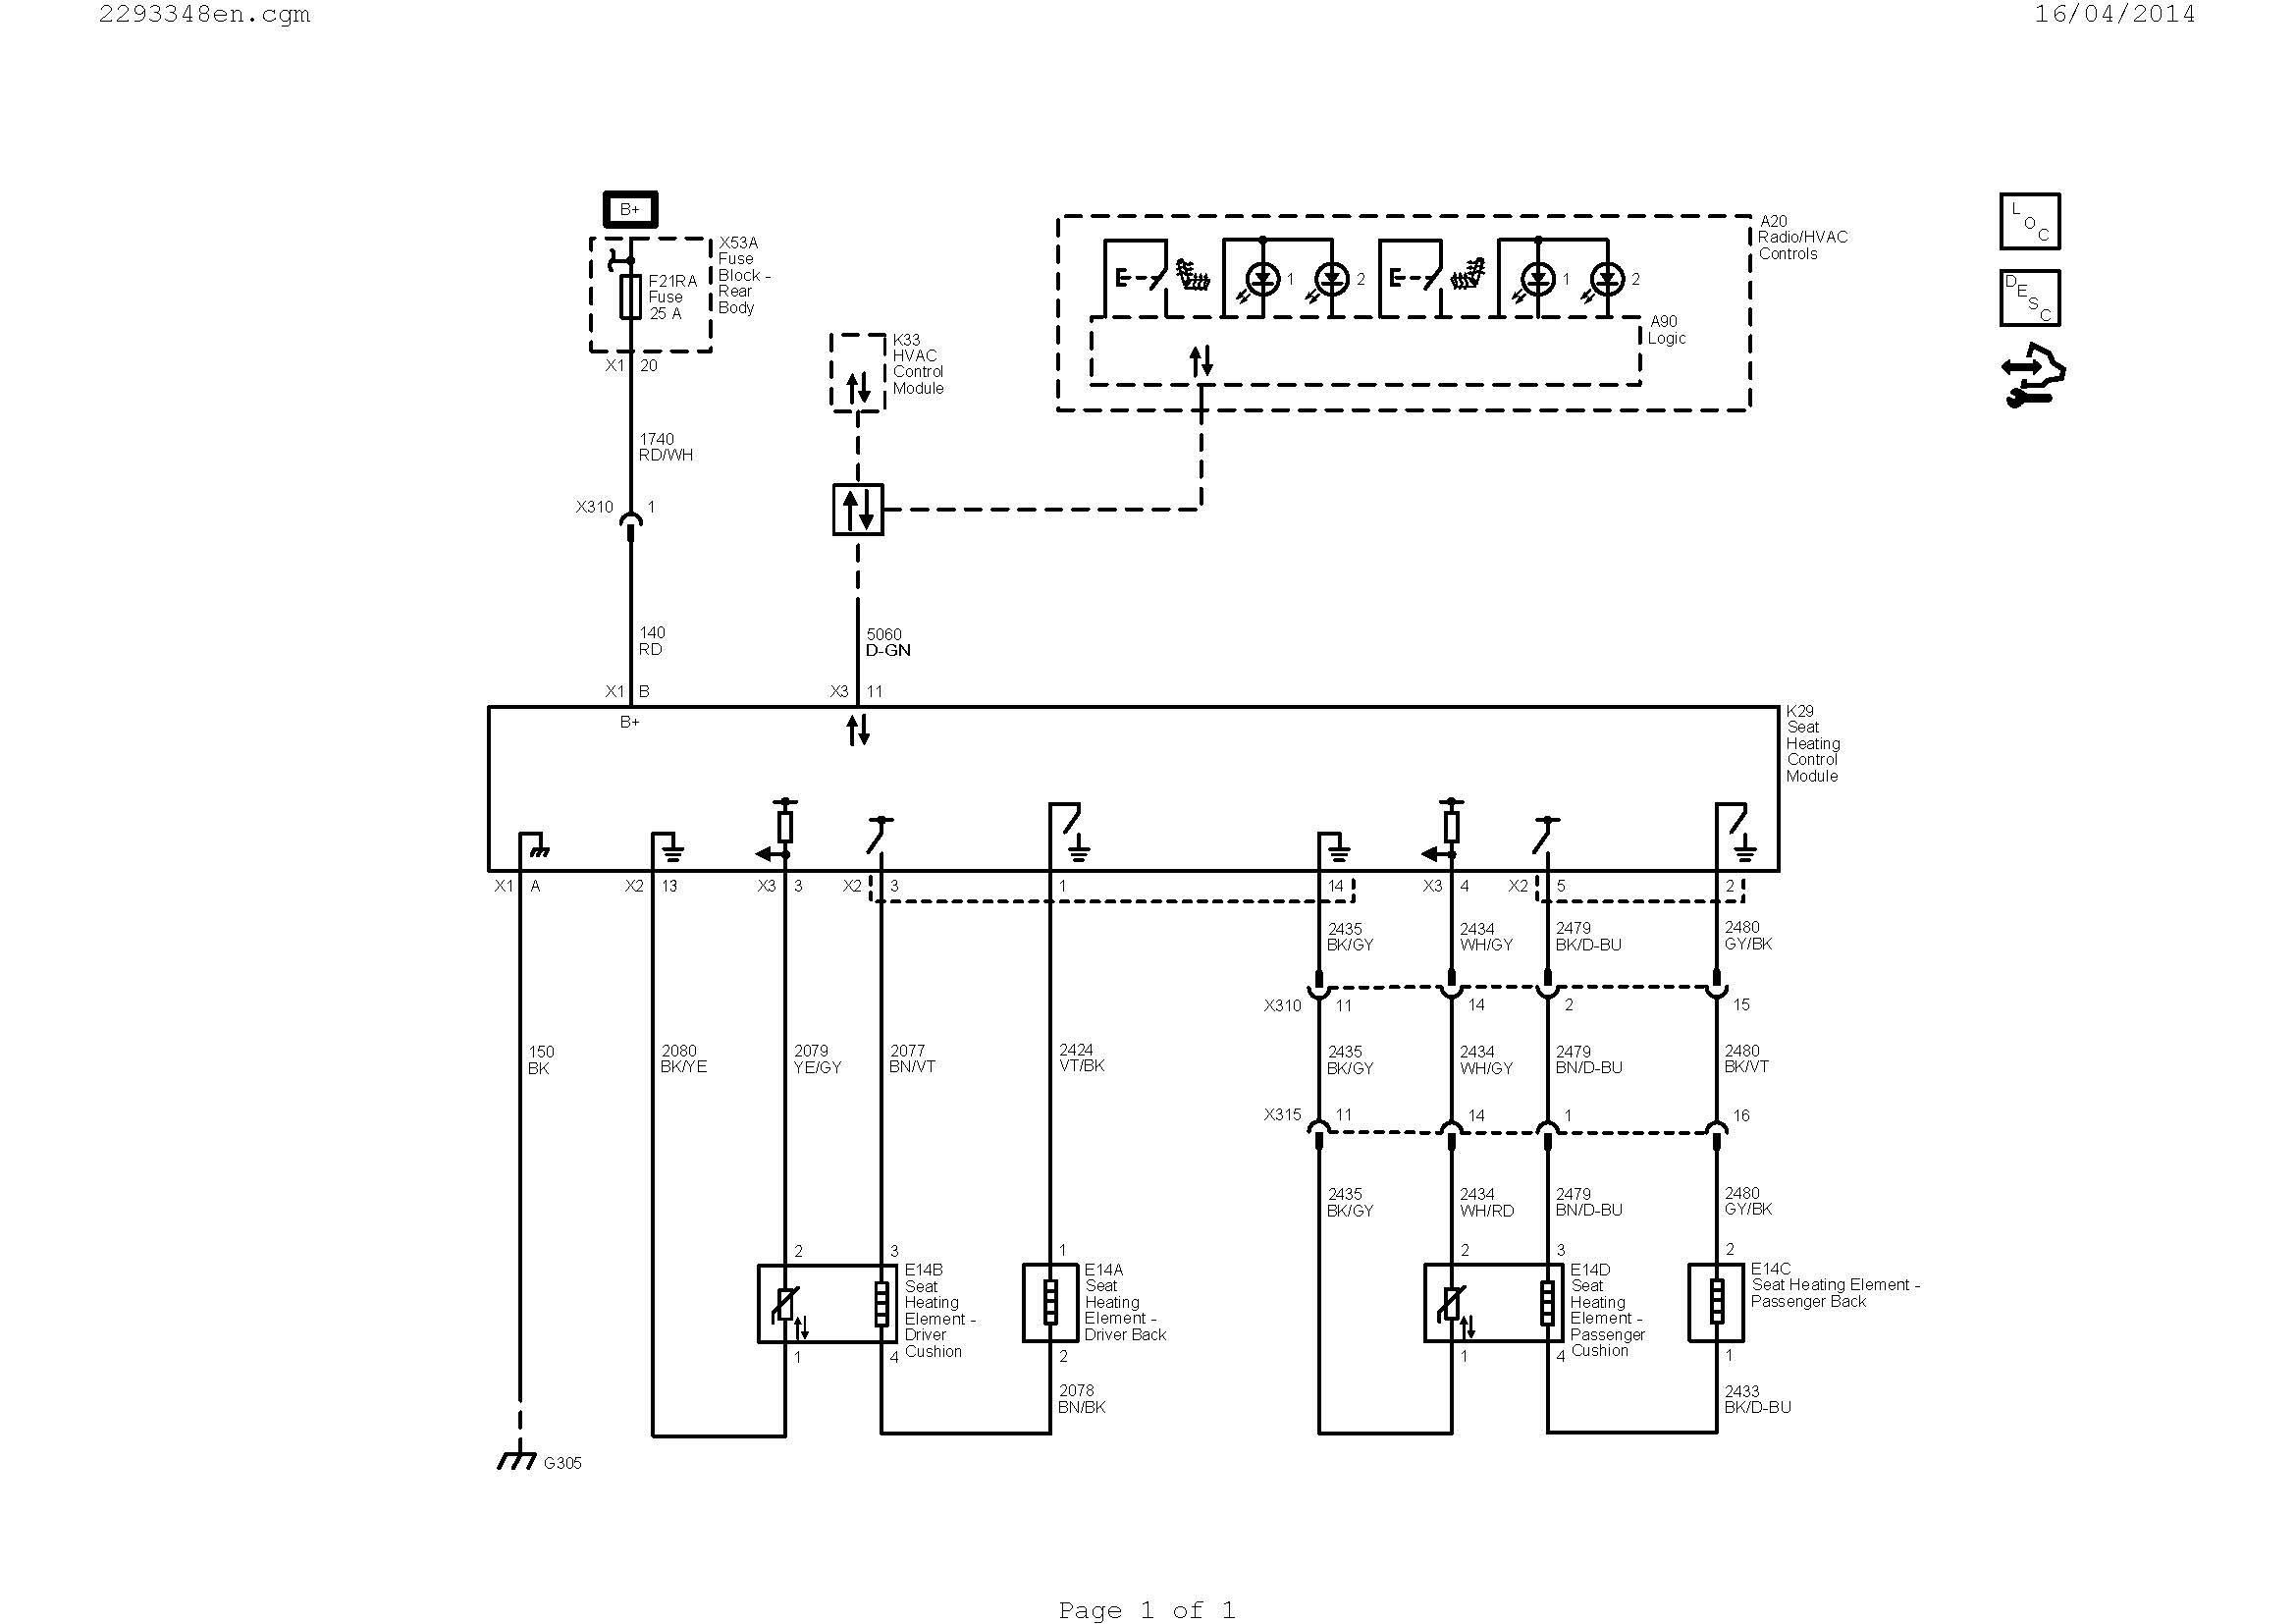 wiring diagram symbols Download-understanding hvac wiring diagrams Download Diagram Websites Unique Hvac Diagram 0d – Wire Diagram 14 17-n